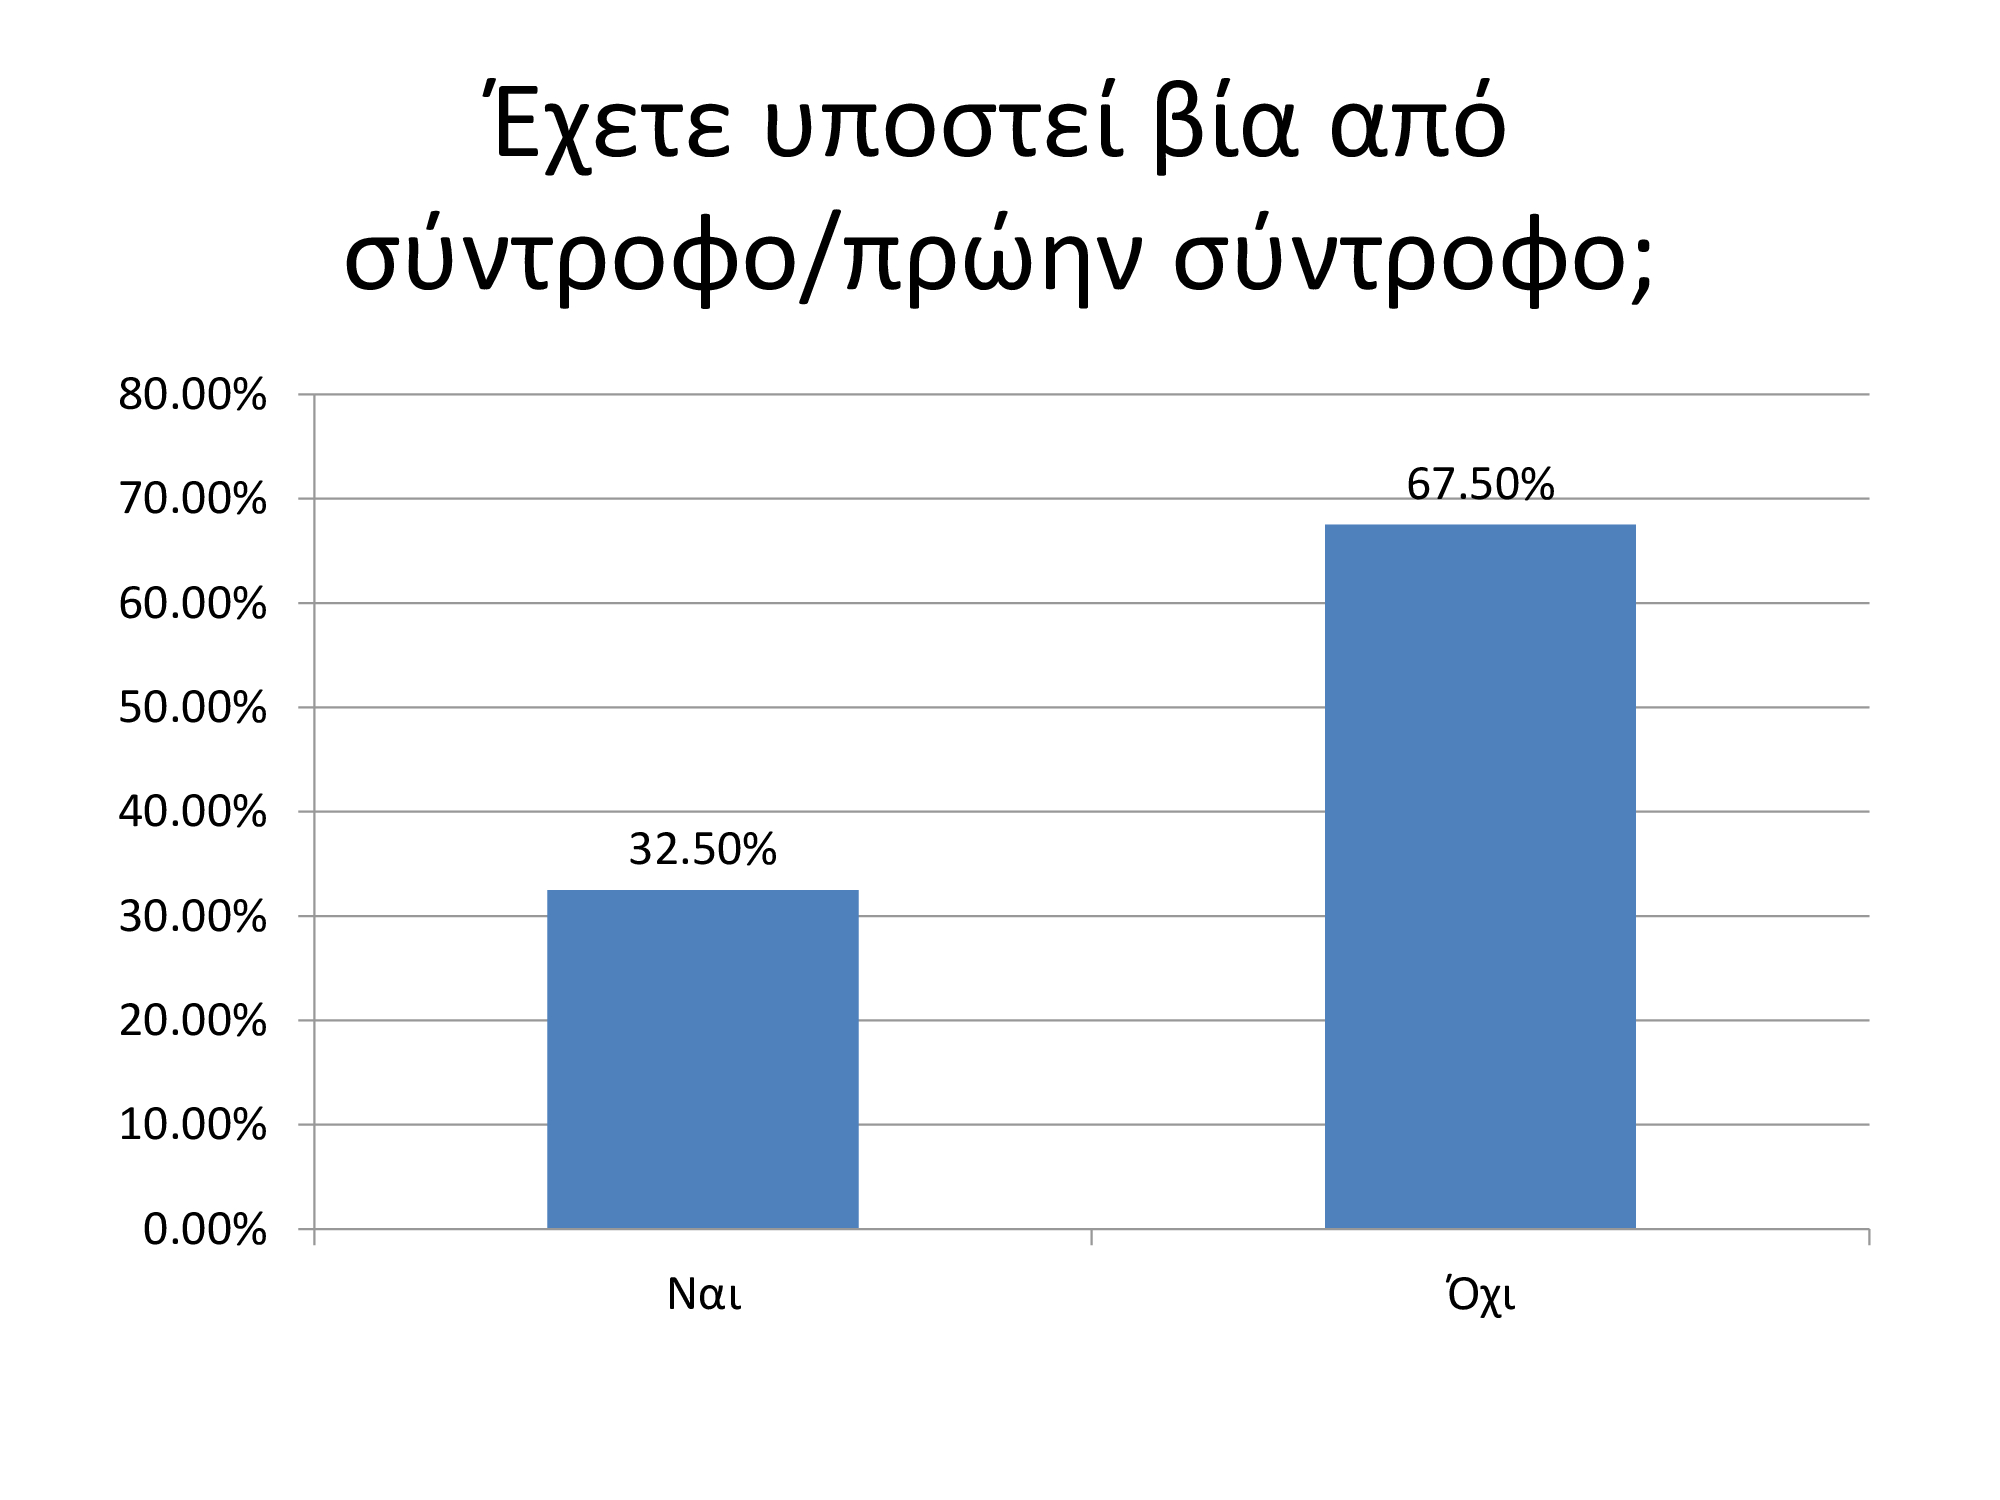 %ce%ad%cf%81%ce%b5%cf%85%ce%bd%ce%b1-%ce%b3%cf%81%ce%bf%ce%b8%ce%b9%ce%ac-%cf%84%ce%bf%cf%85-%ce%b1%ce%bd%ce%b4%cf%81%ce%bf%ce%bb%ce%bf%ce%b3%ce%b9%ce%ba%ce%bf%cf%8d-%ce%b9%ce%bd%cf%83%cf%84%ce%b93